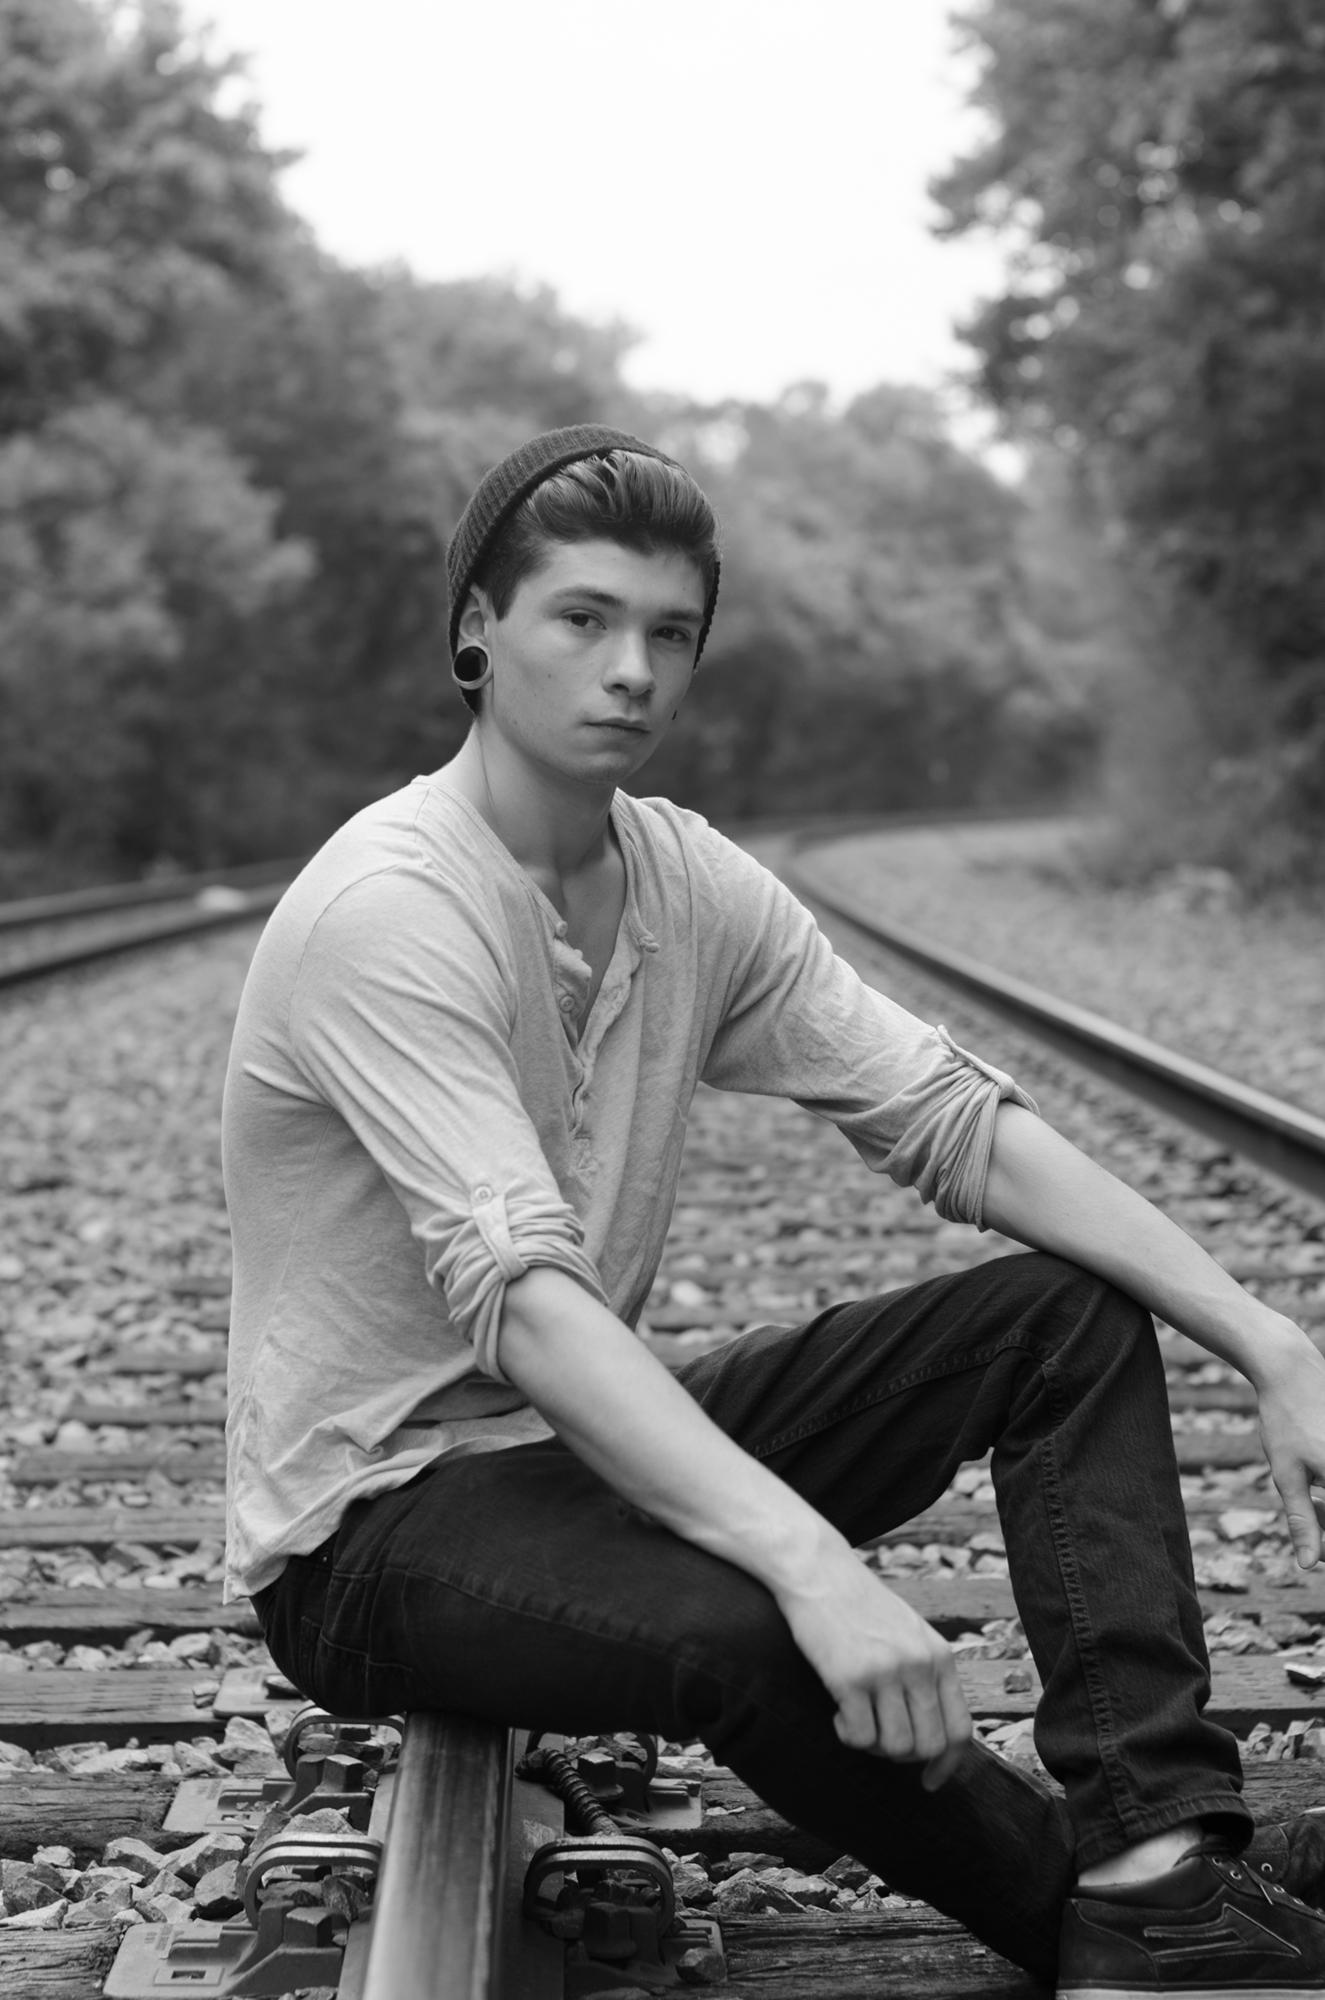 Luke Smith, Class of 2015, Senior Photos.